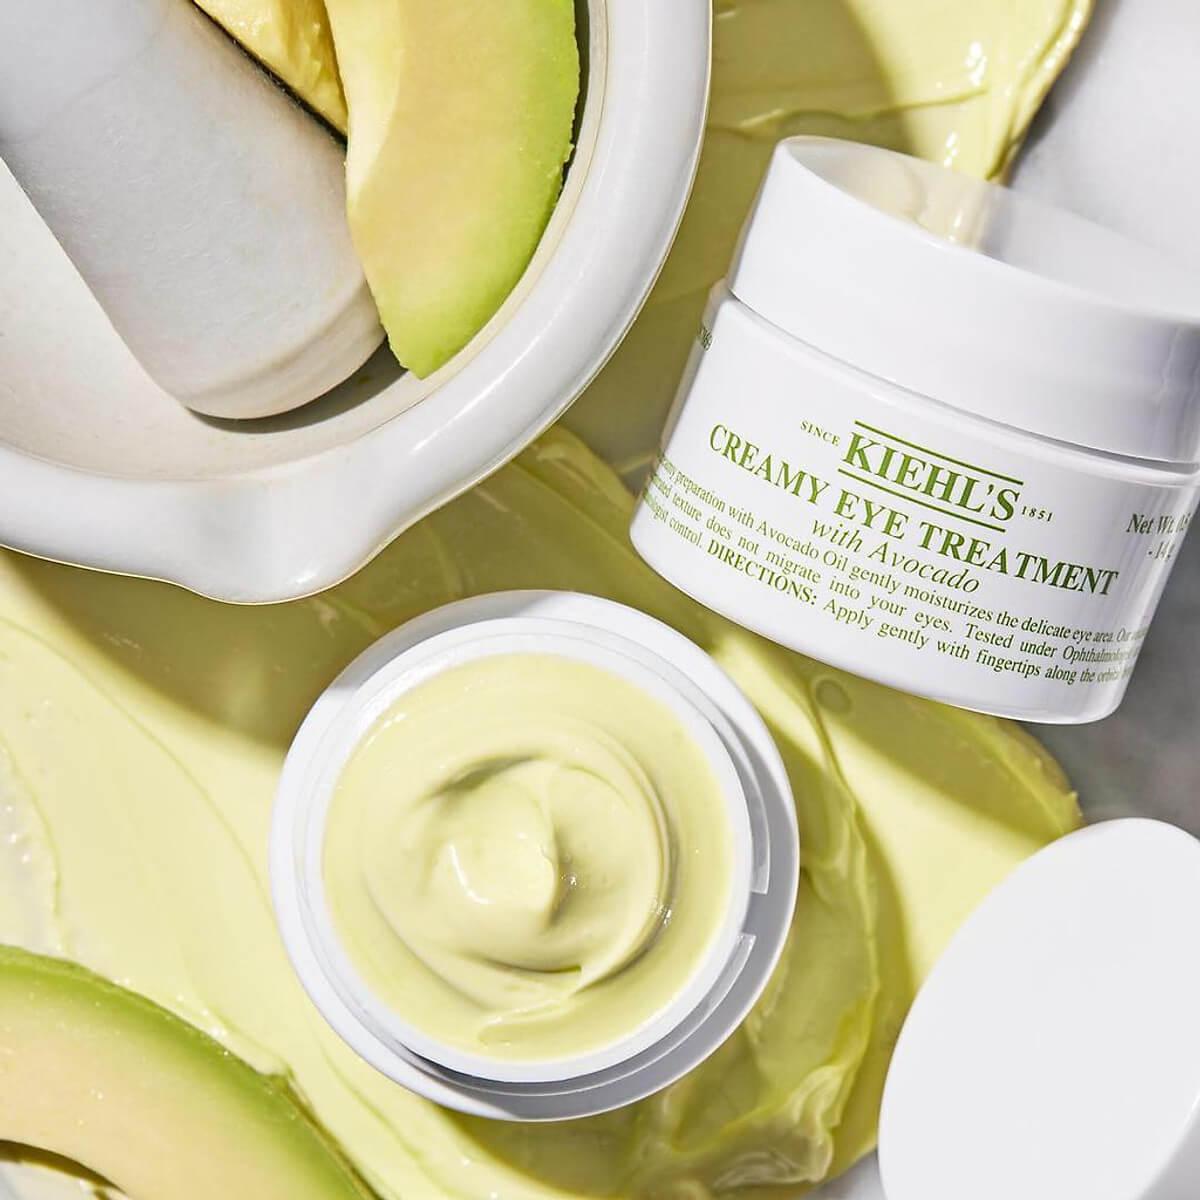 Kem Dưỡng Mắt Chống Nếp Nhăn Kiehl's Creamy Eye Treatment With Avocado